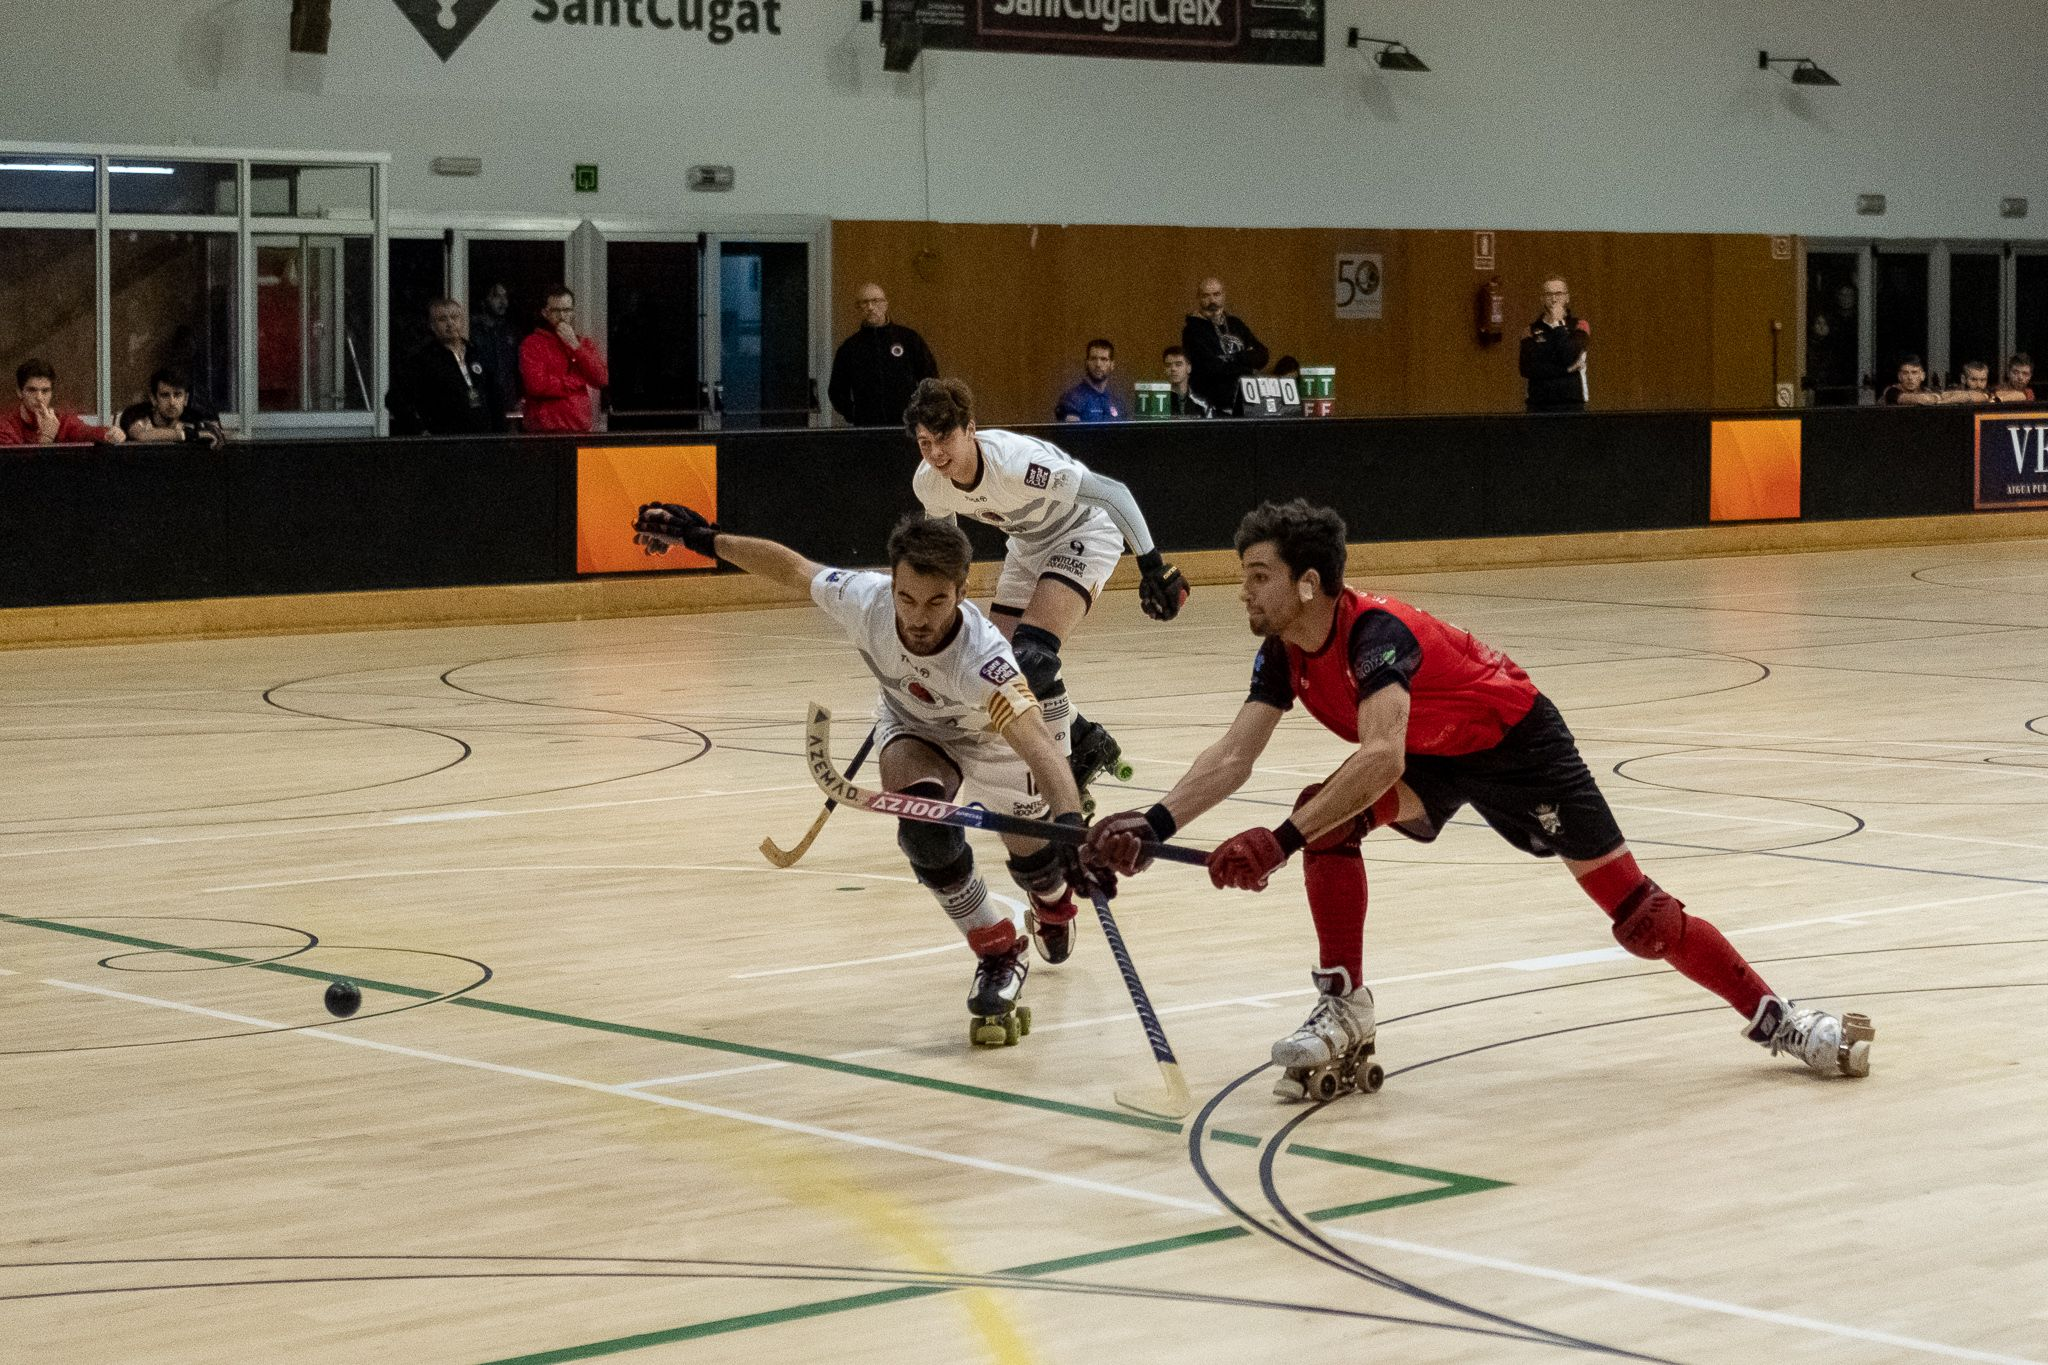 Hoquei sobre patins masculí. Partit de lliga. PHC Sant Cugat-HC Burguillos Extremadura. FOTO: Ale Gómez